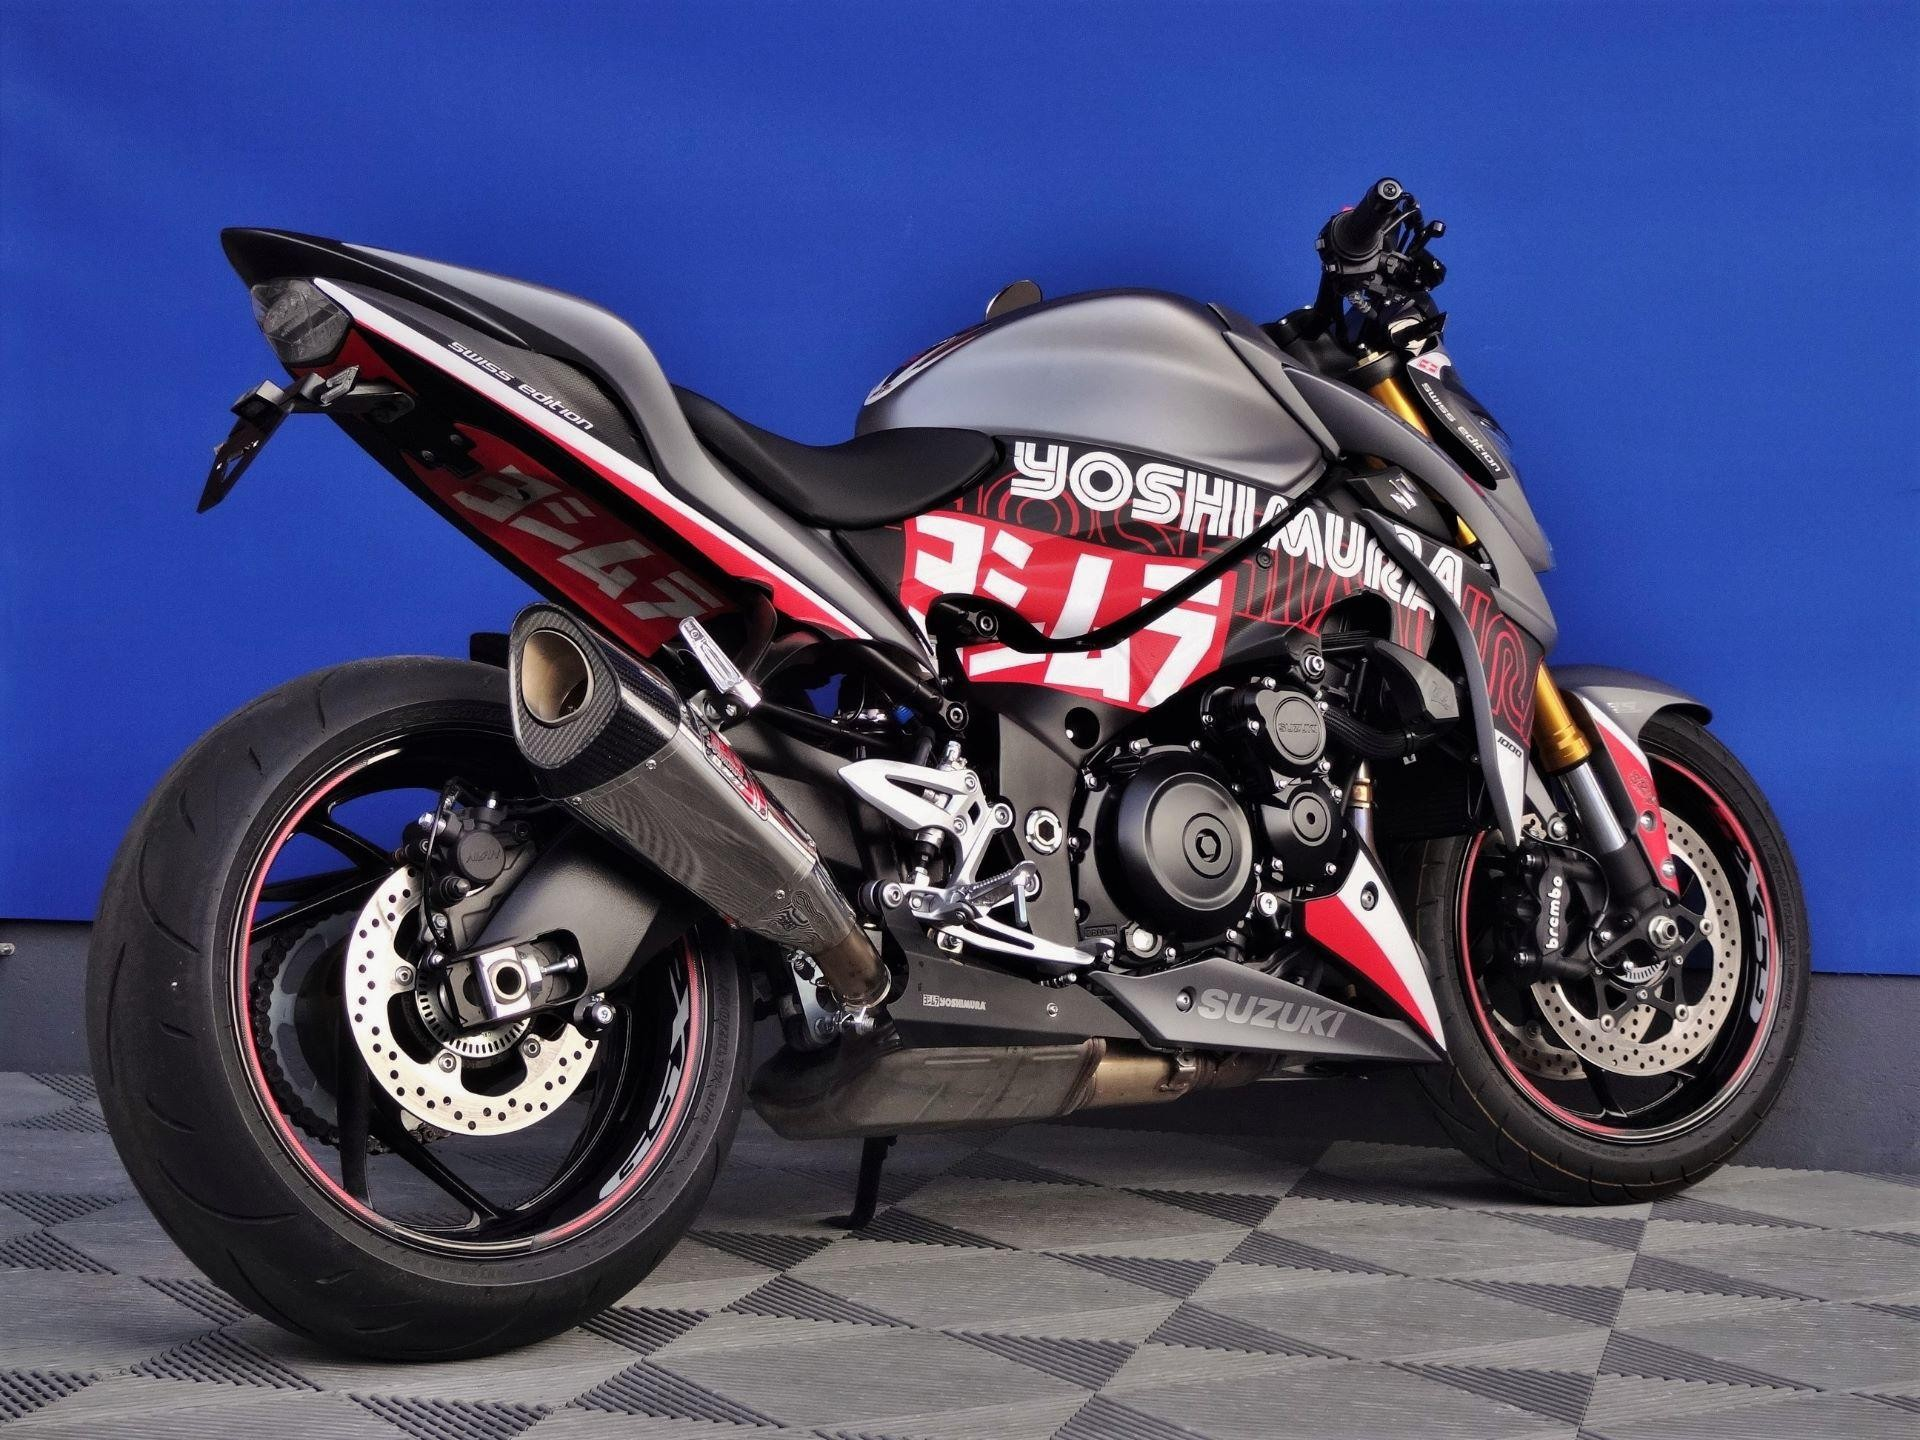 suzuki motorrad gsx s 1000 motorrad bild idee. Black Bedroom Furniture Sets. Home Design Ideas